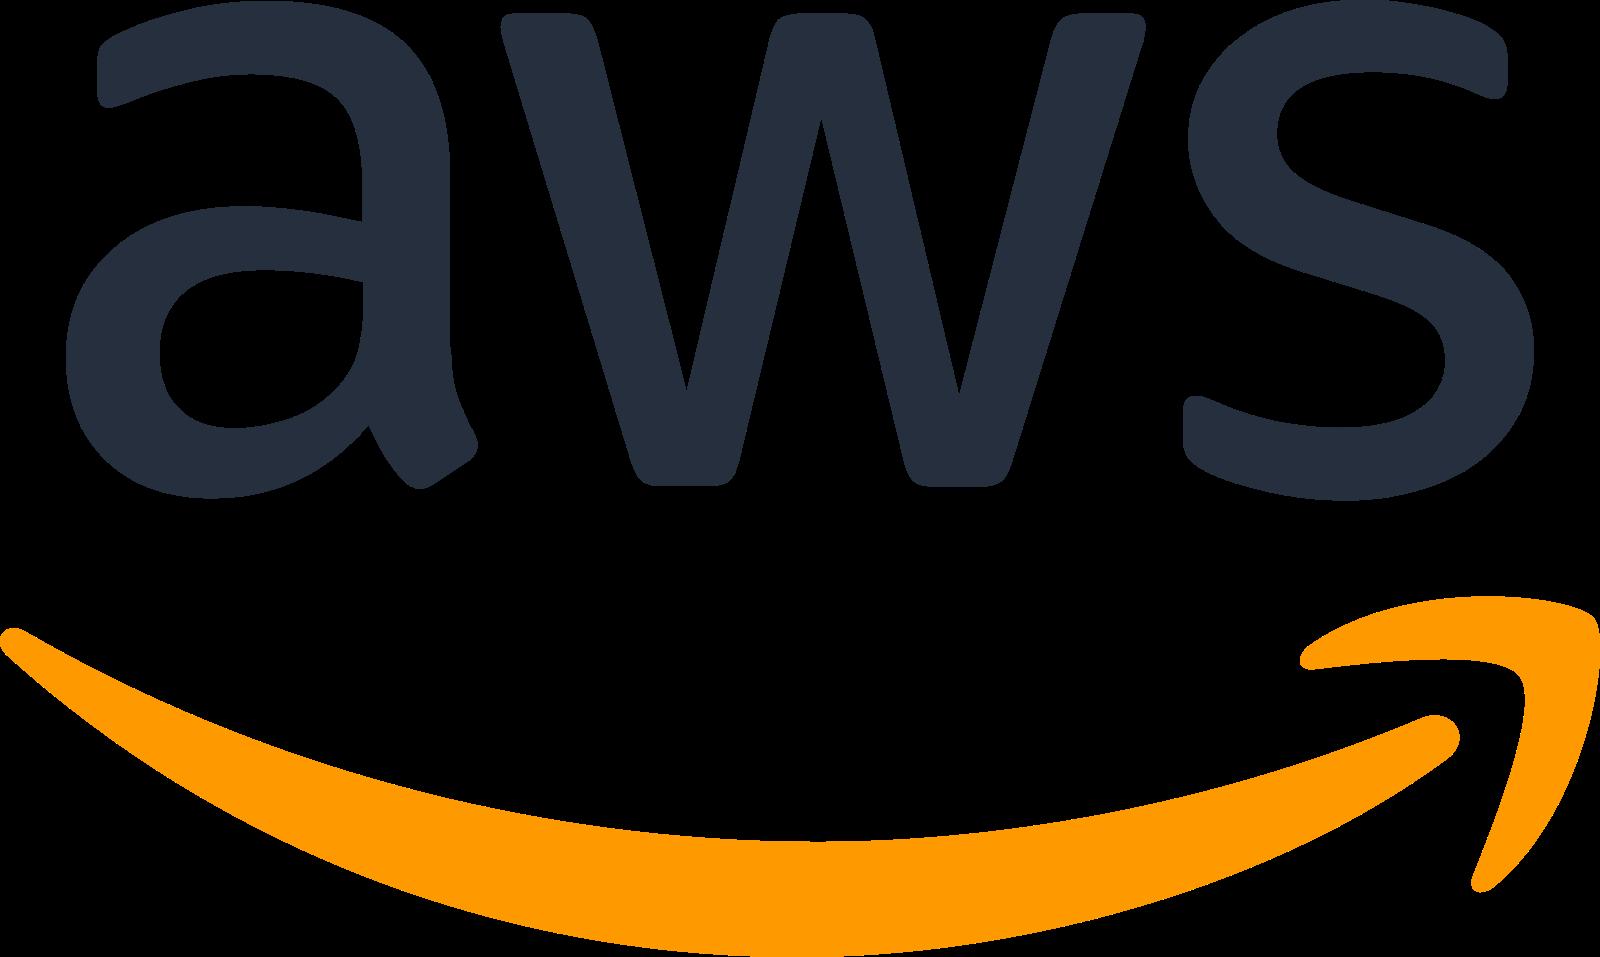 amazon-web-services-logo-4